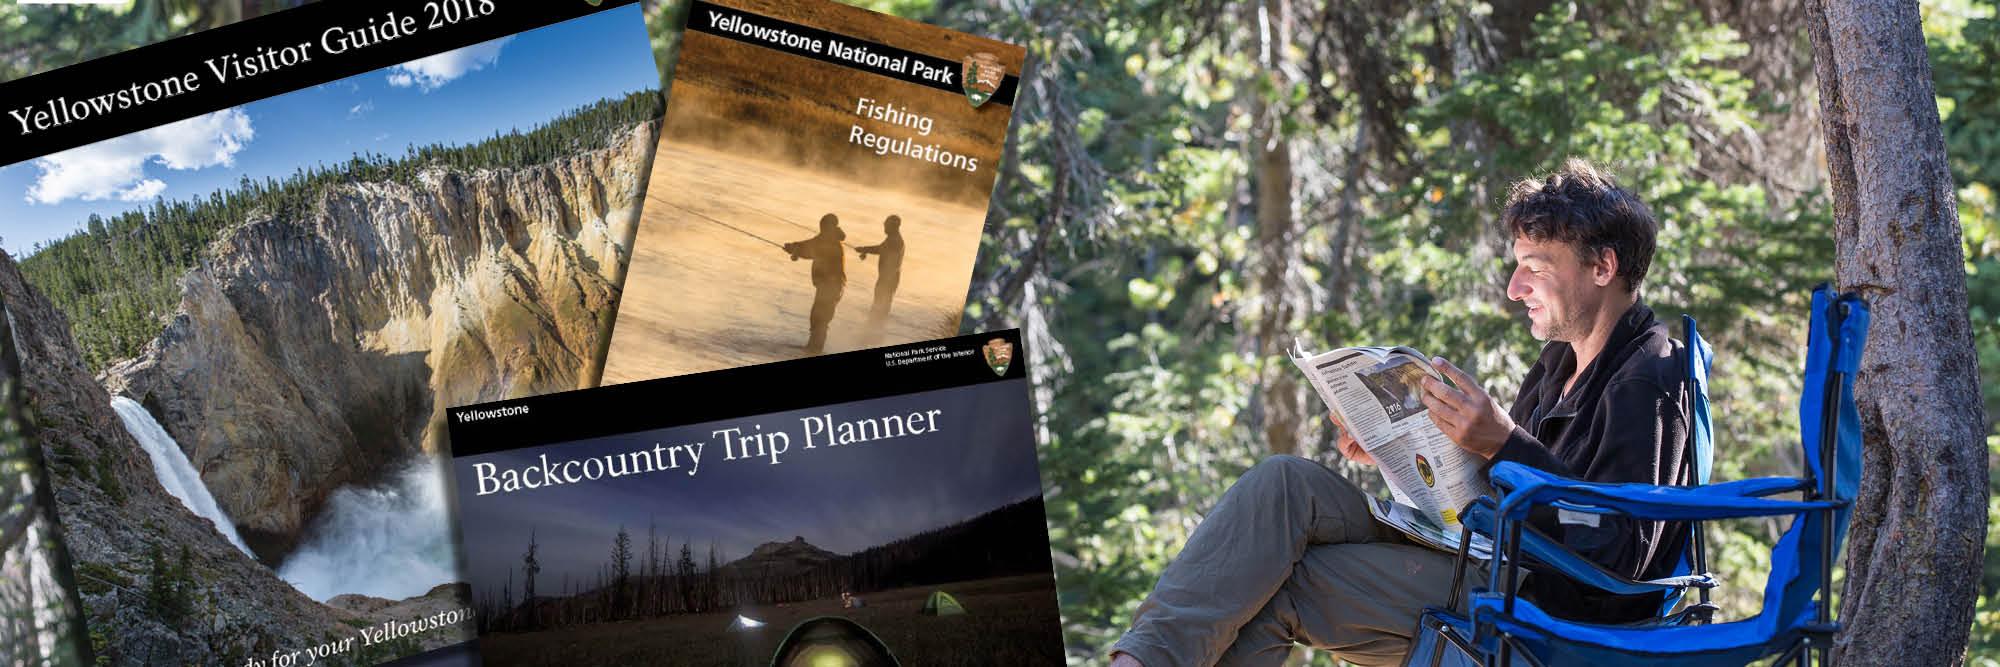 Brochures Yellowstone National Park U S National Park